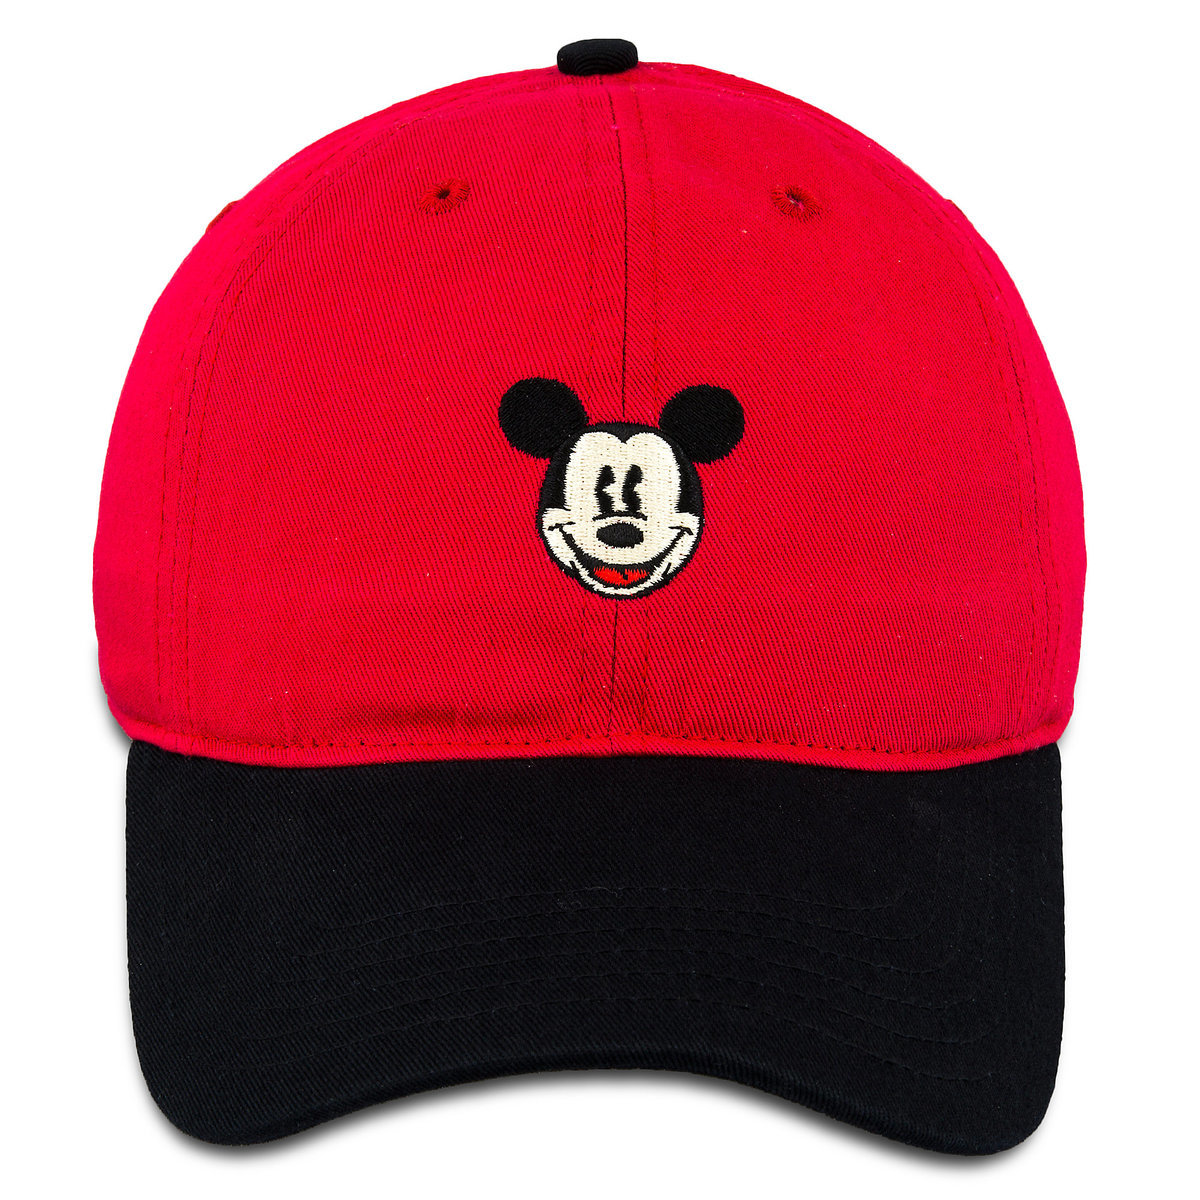 Disney Baseball Cap - Mickey Mouse Two-Tone - Red Black 70fa1b552ce